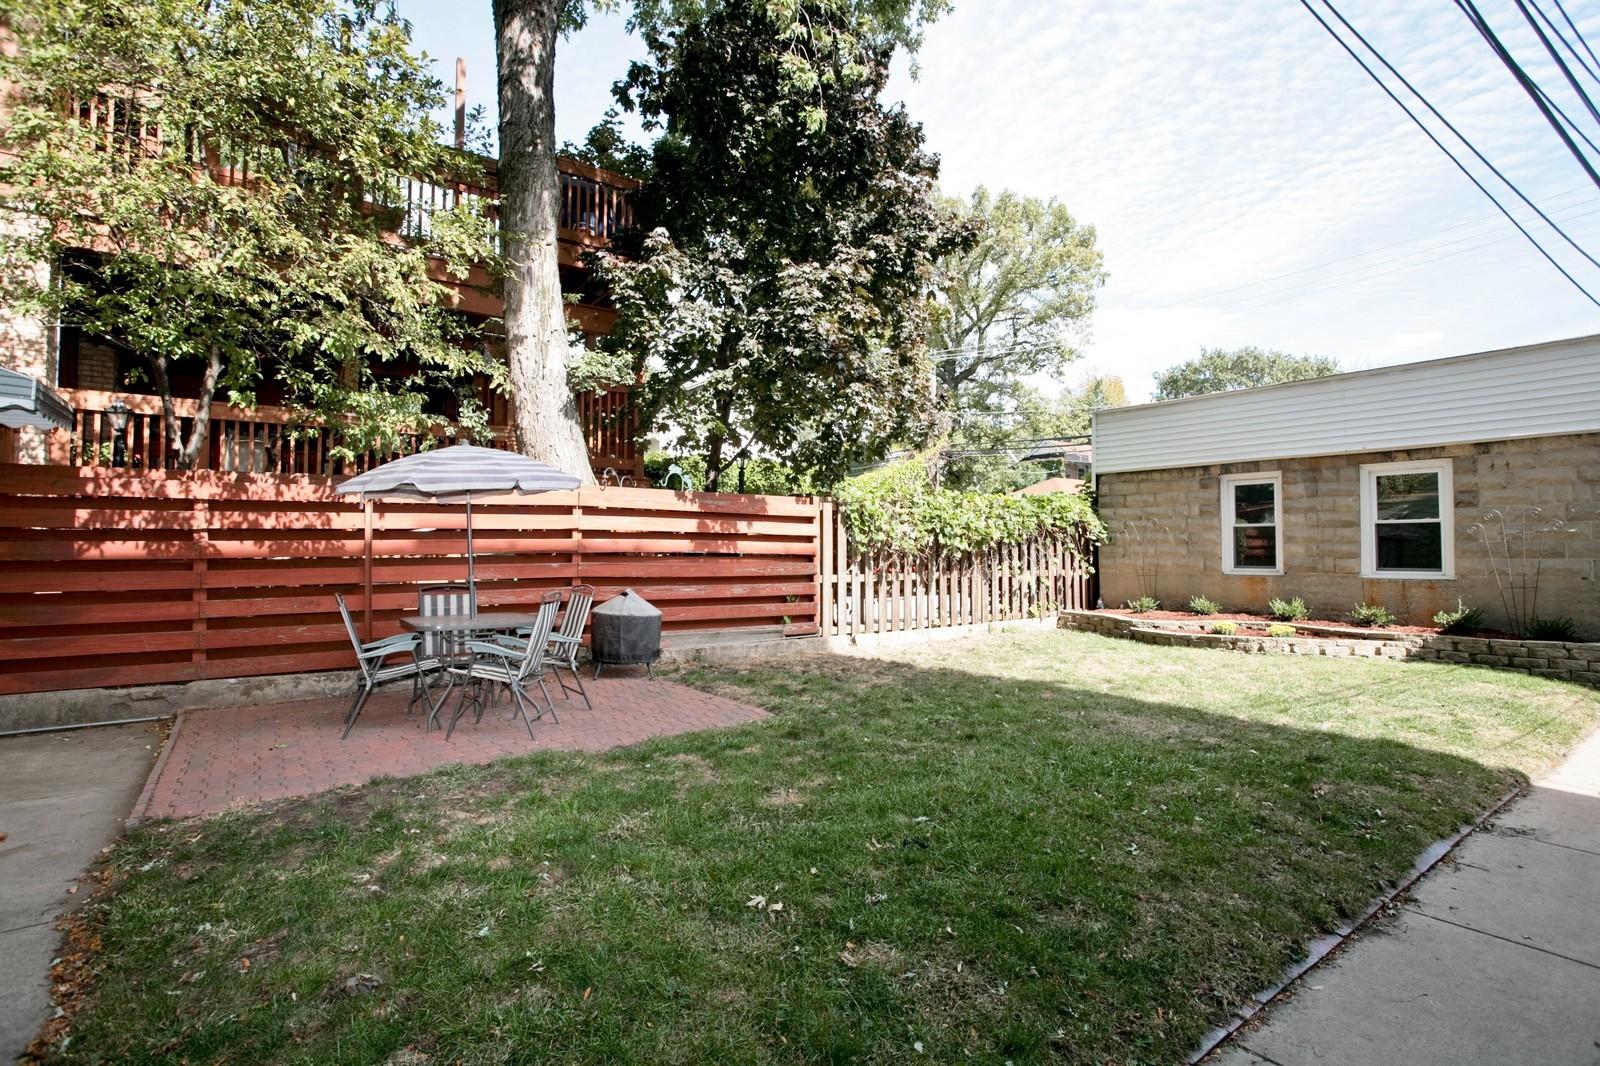 Real Estate Photography - 4113 N Ashland, Chicago, IL, 60613 - Back Yard